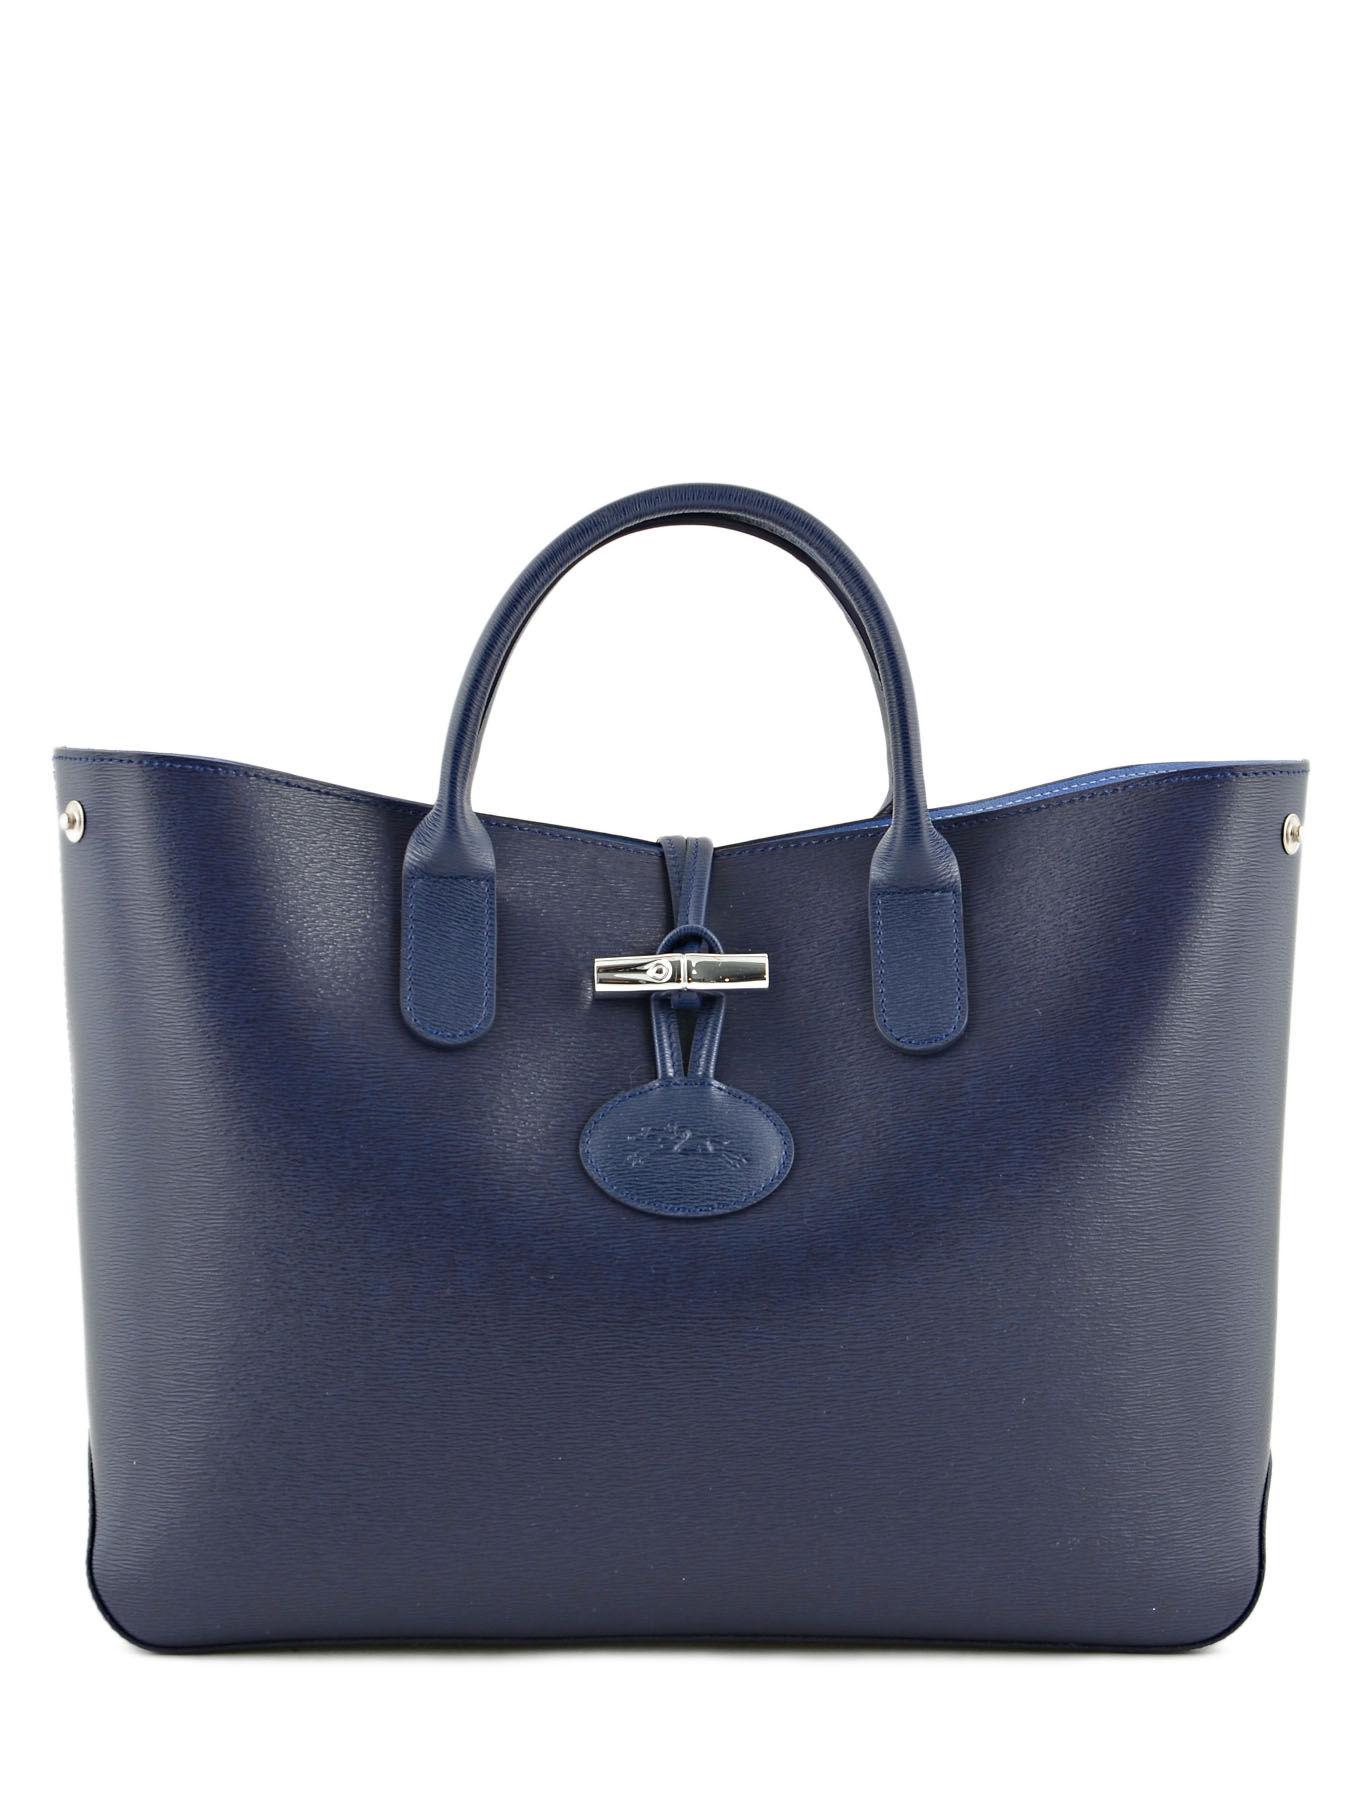 Sac Longchamps Bleu Marine mado ludwick fr